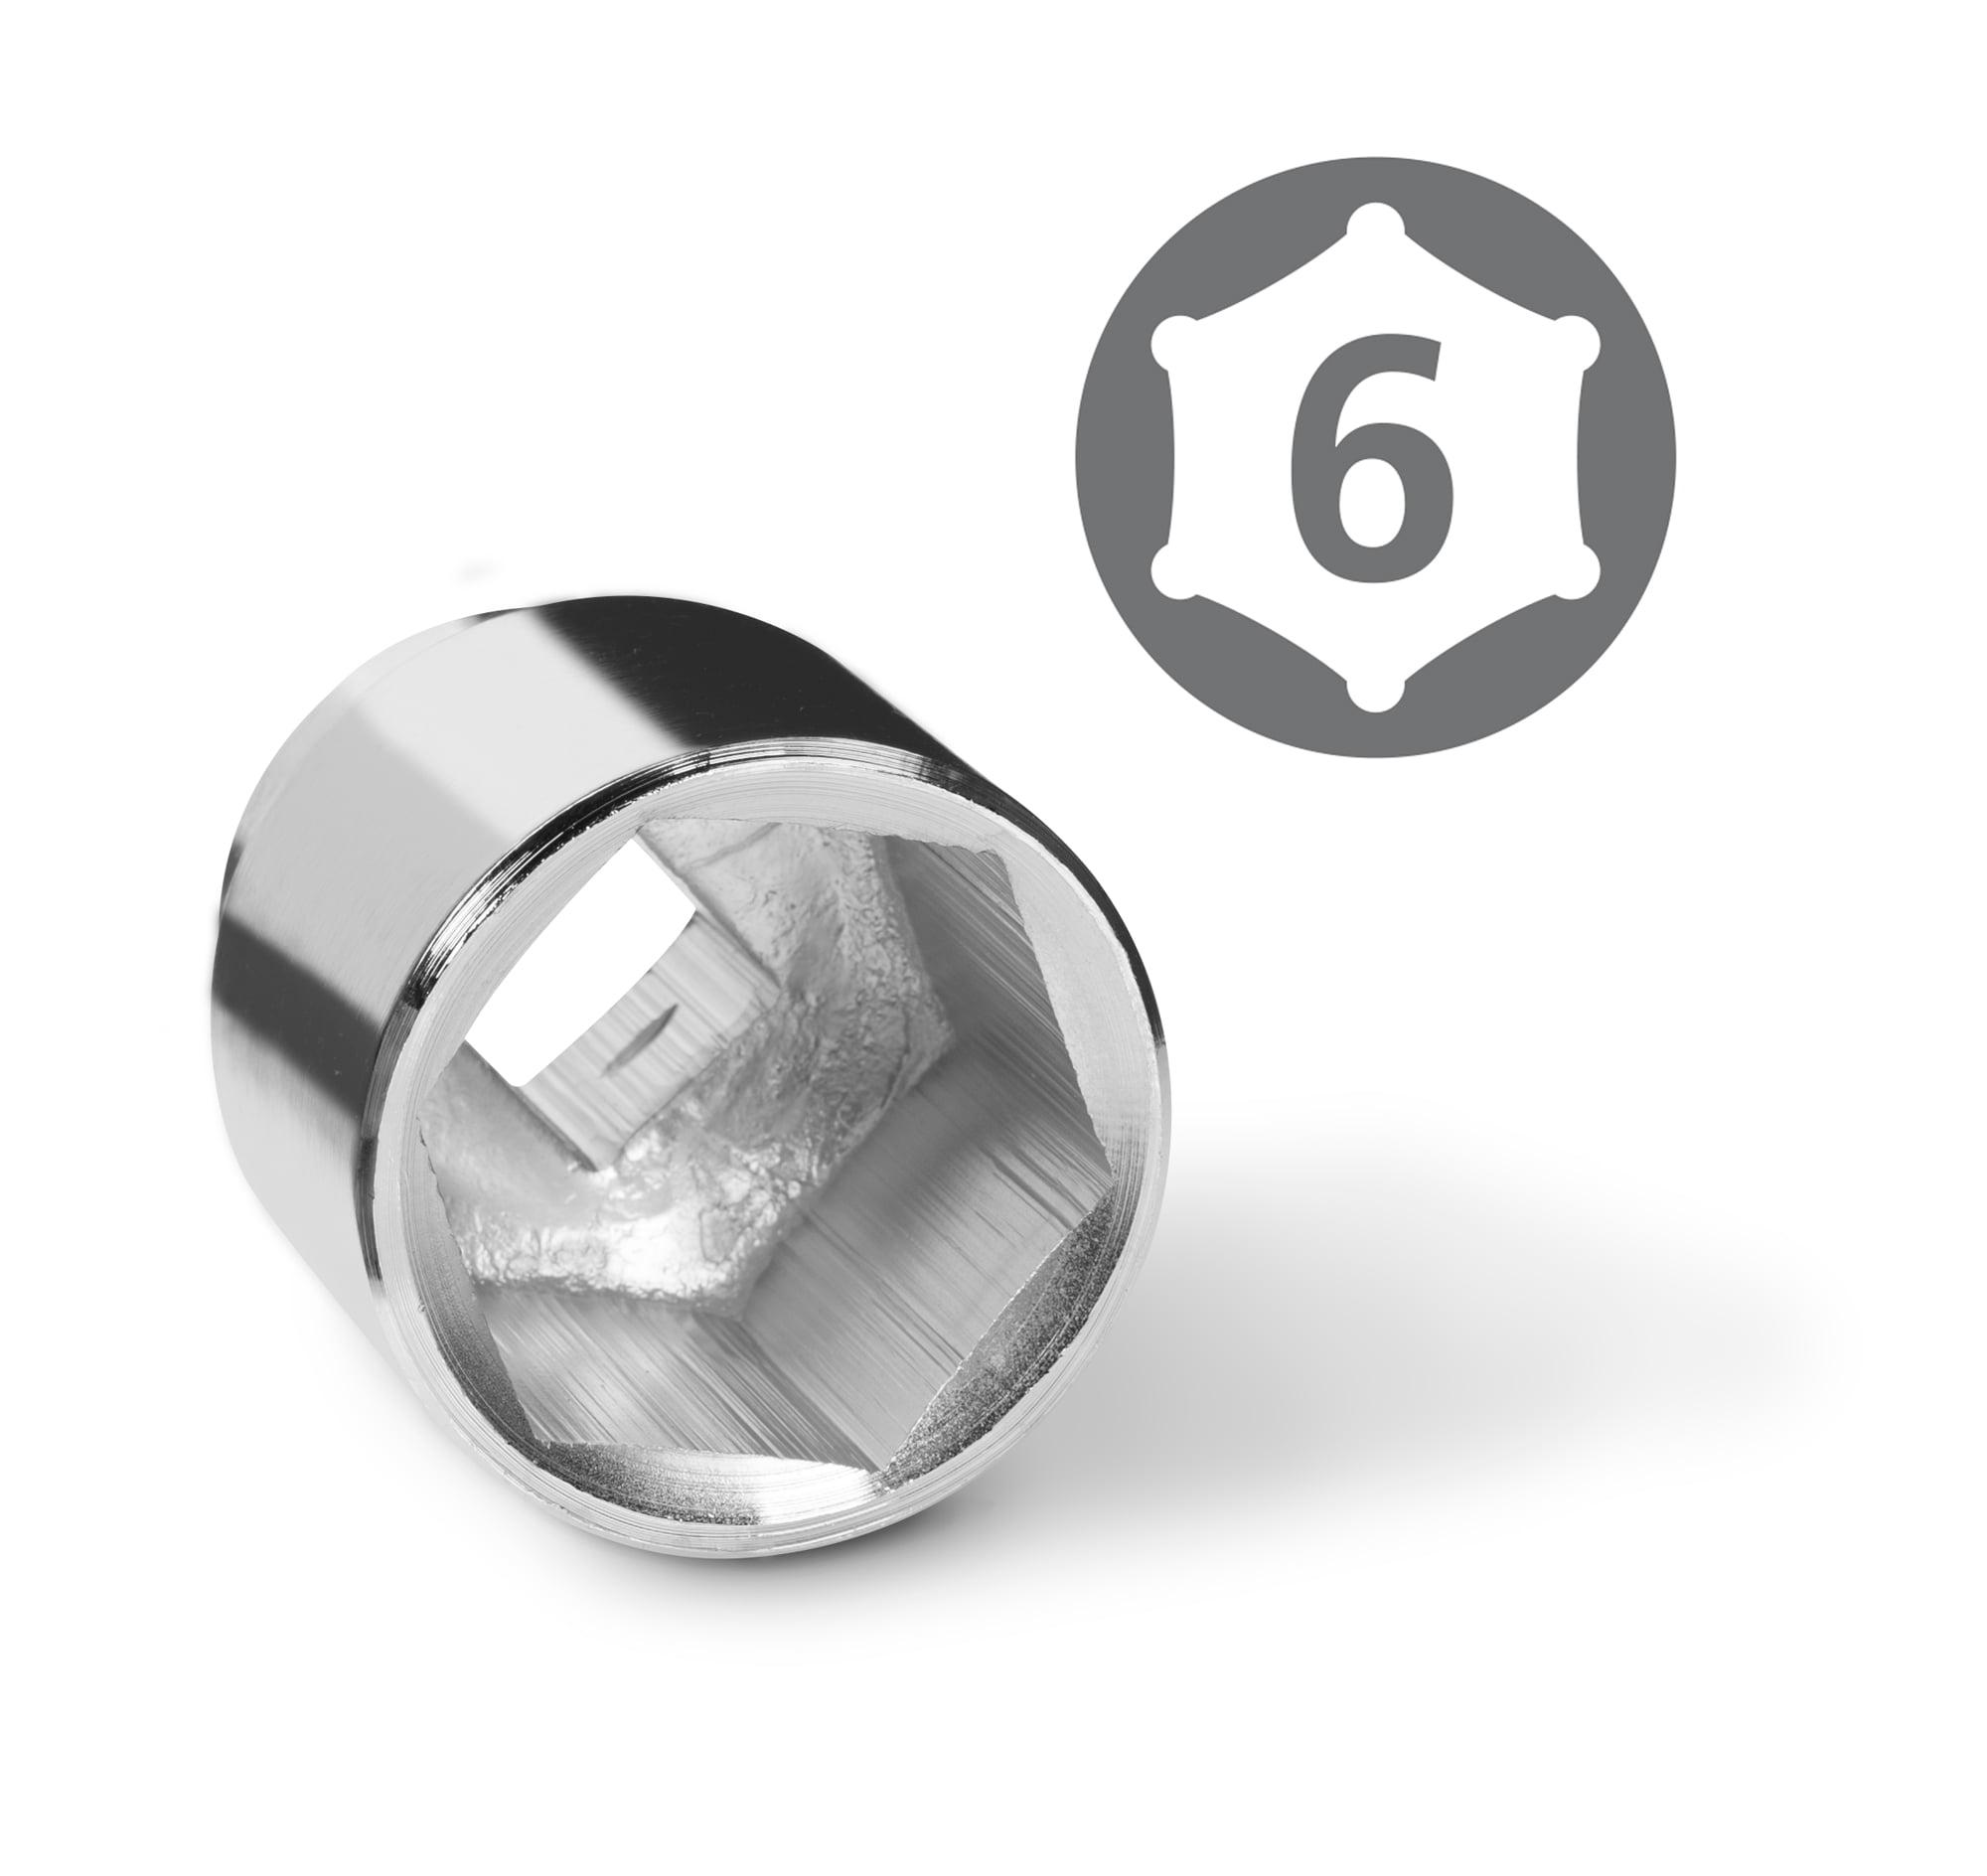 TEKTON 3/4-Inch Drive Jumbo Socket Set, Inch, 7/8-Inch - 2-Inch, 21-Piece   1115